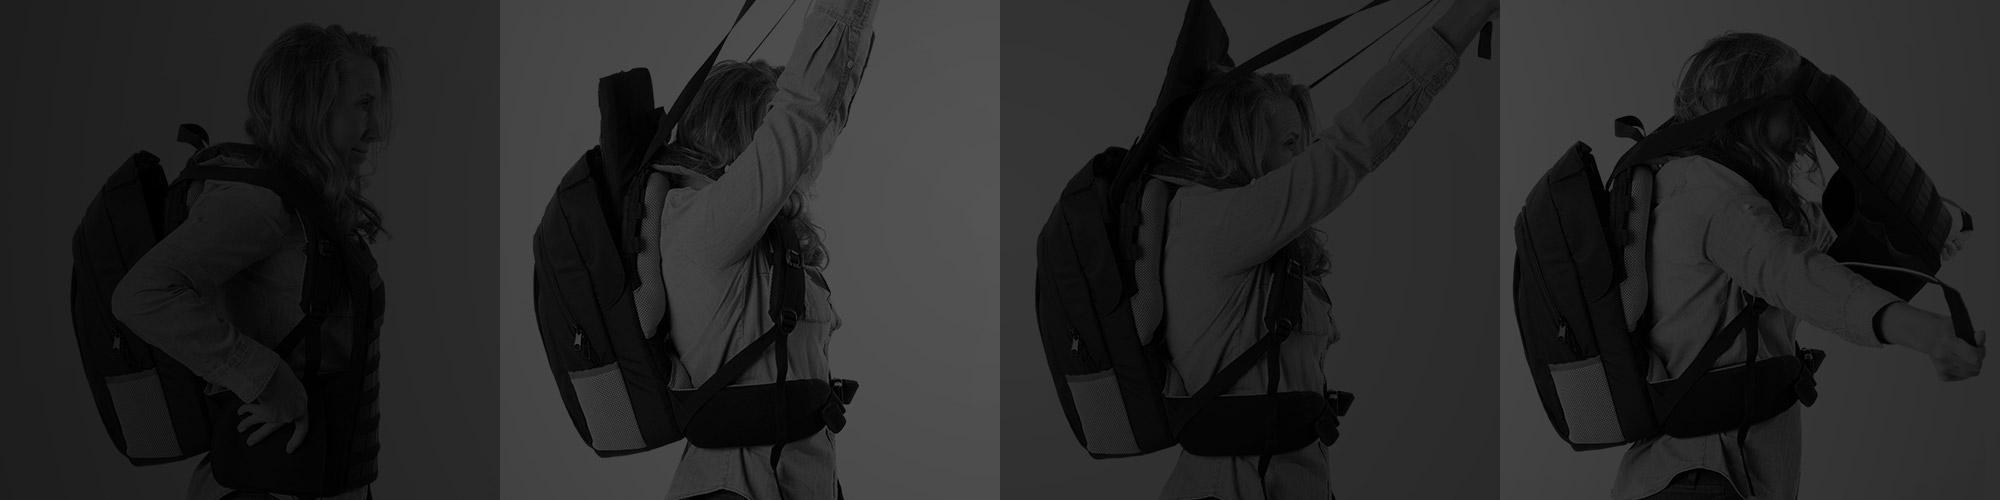 women deploying bulletproof backpack into vest